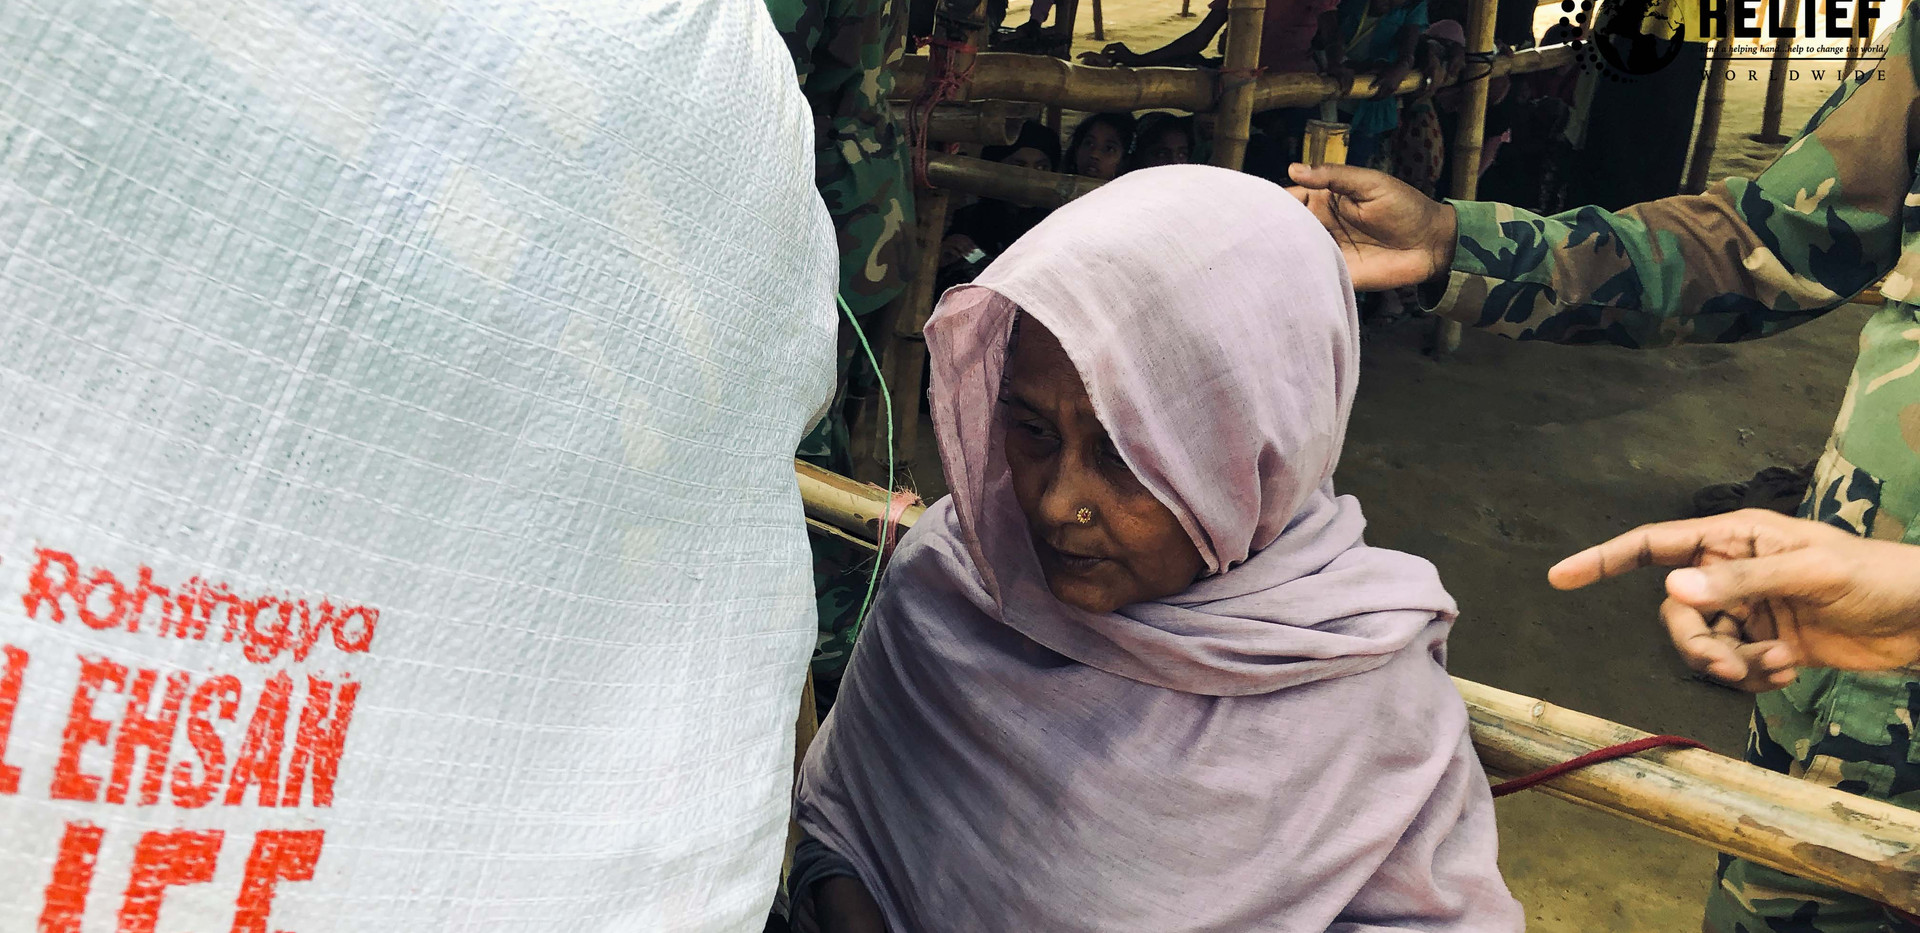 2017 Winter Kits Distribution in Bangladesh